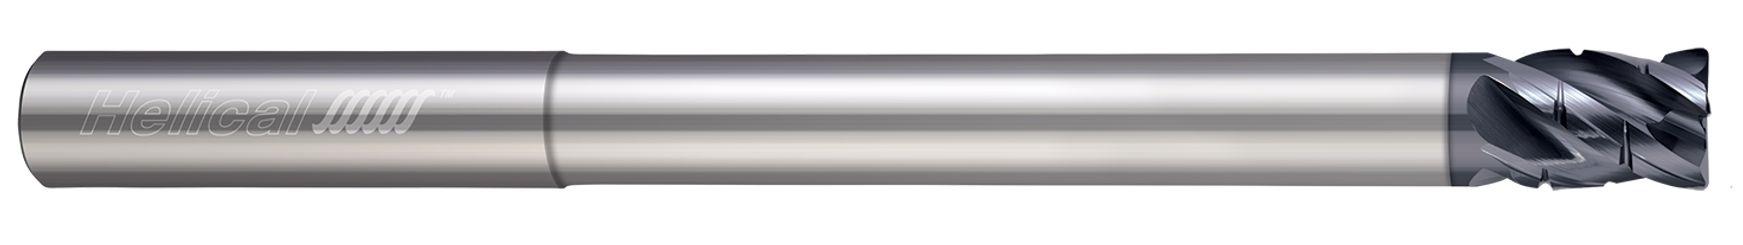 4 Flute - Corner Radius - Chipbreaker Rougher - Variable Pitch - Reduced Neck (Aplus)